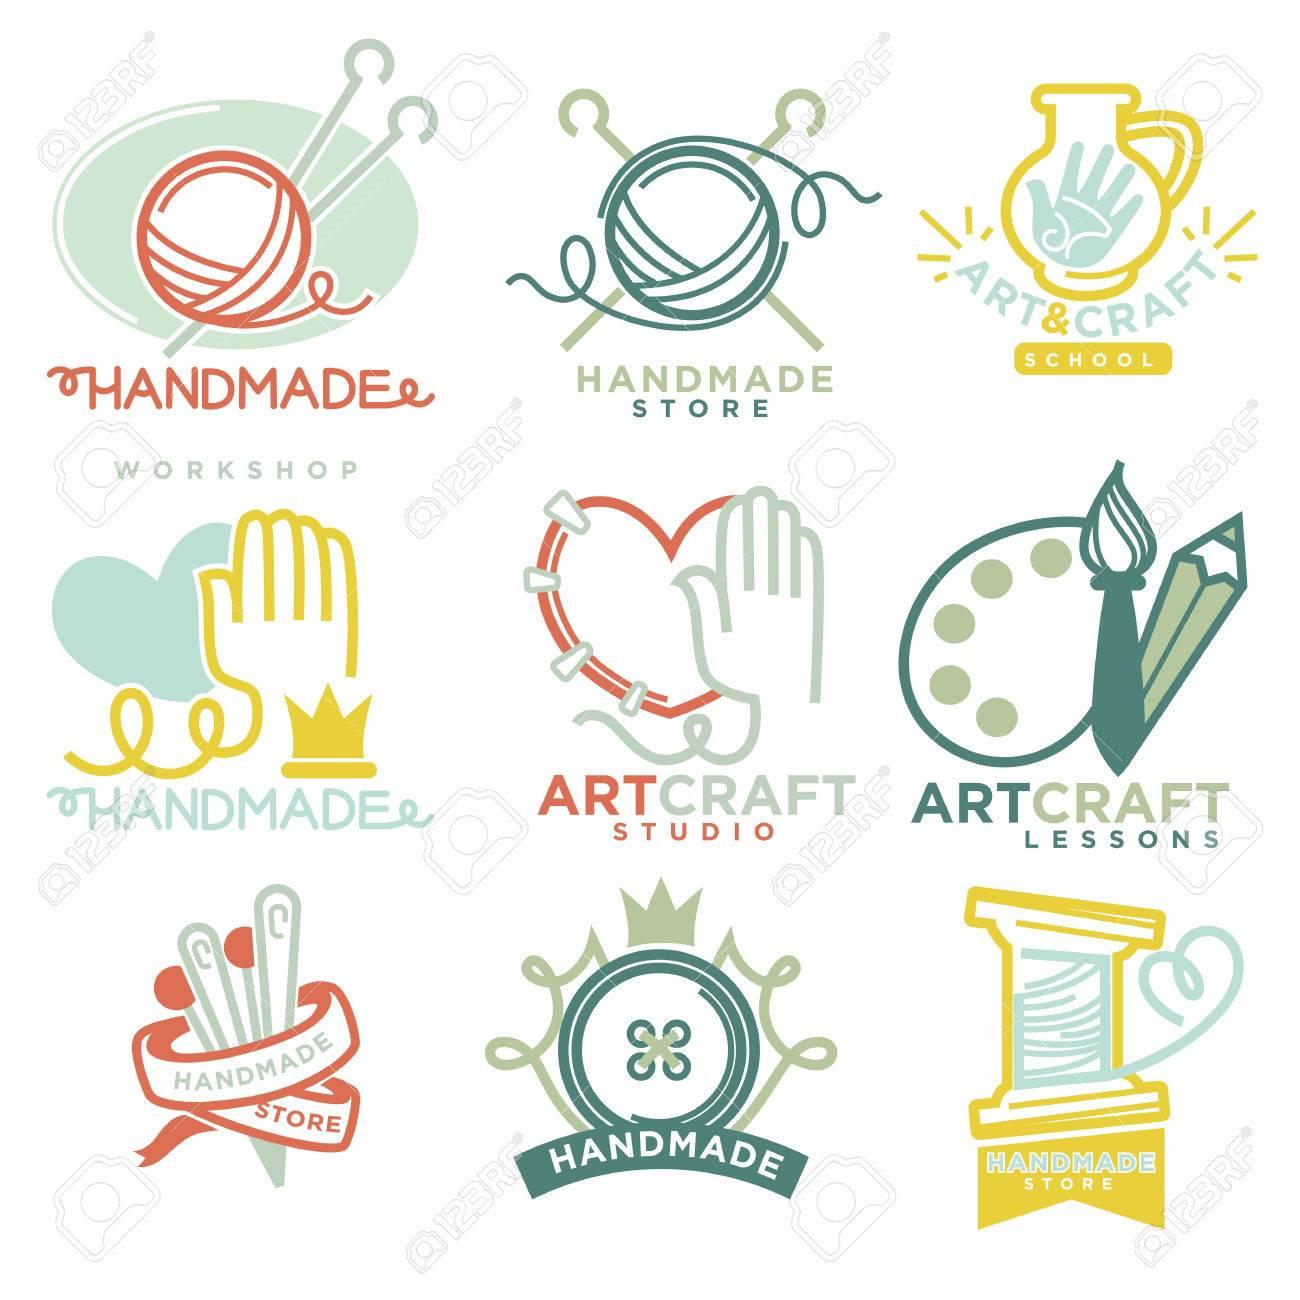 Art And Handmade Craft Logo Templates Flat Set Royalty Free